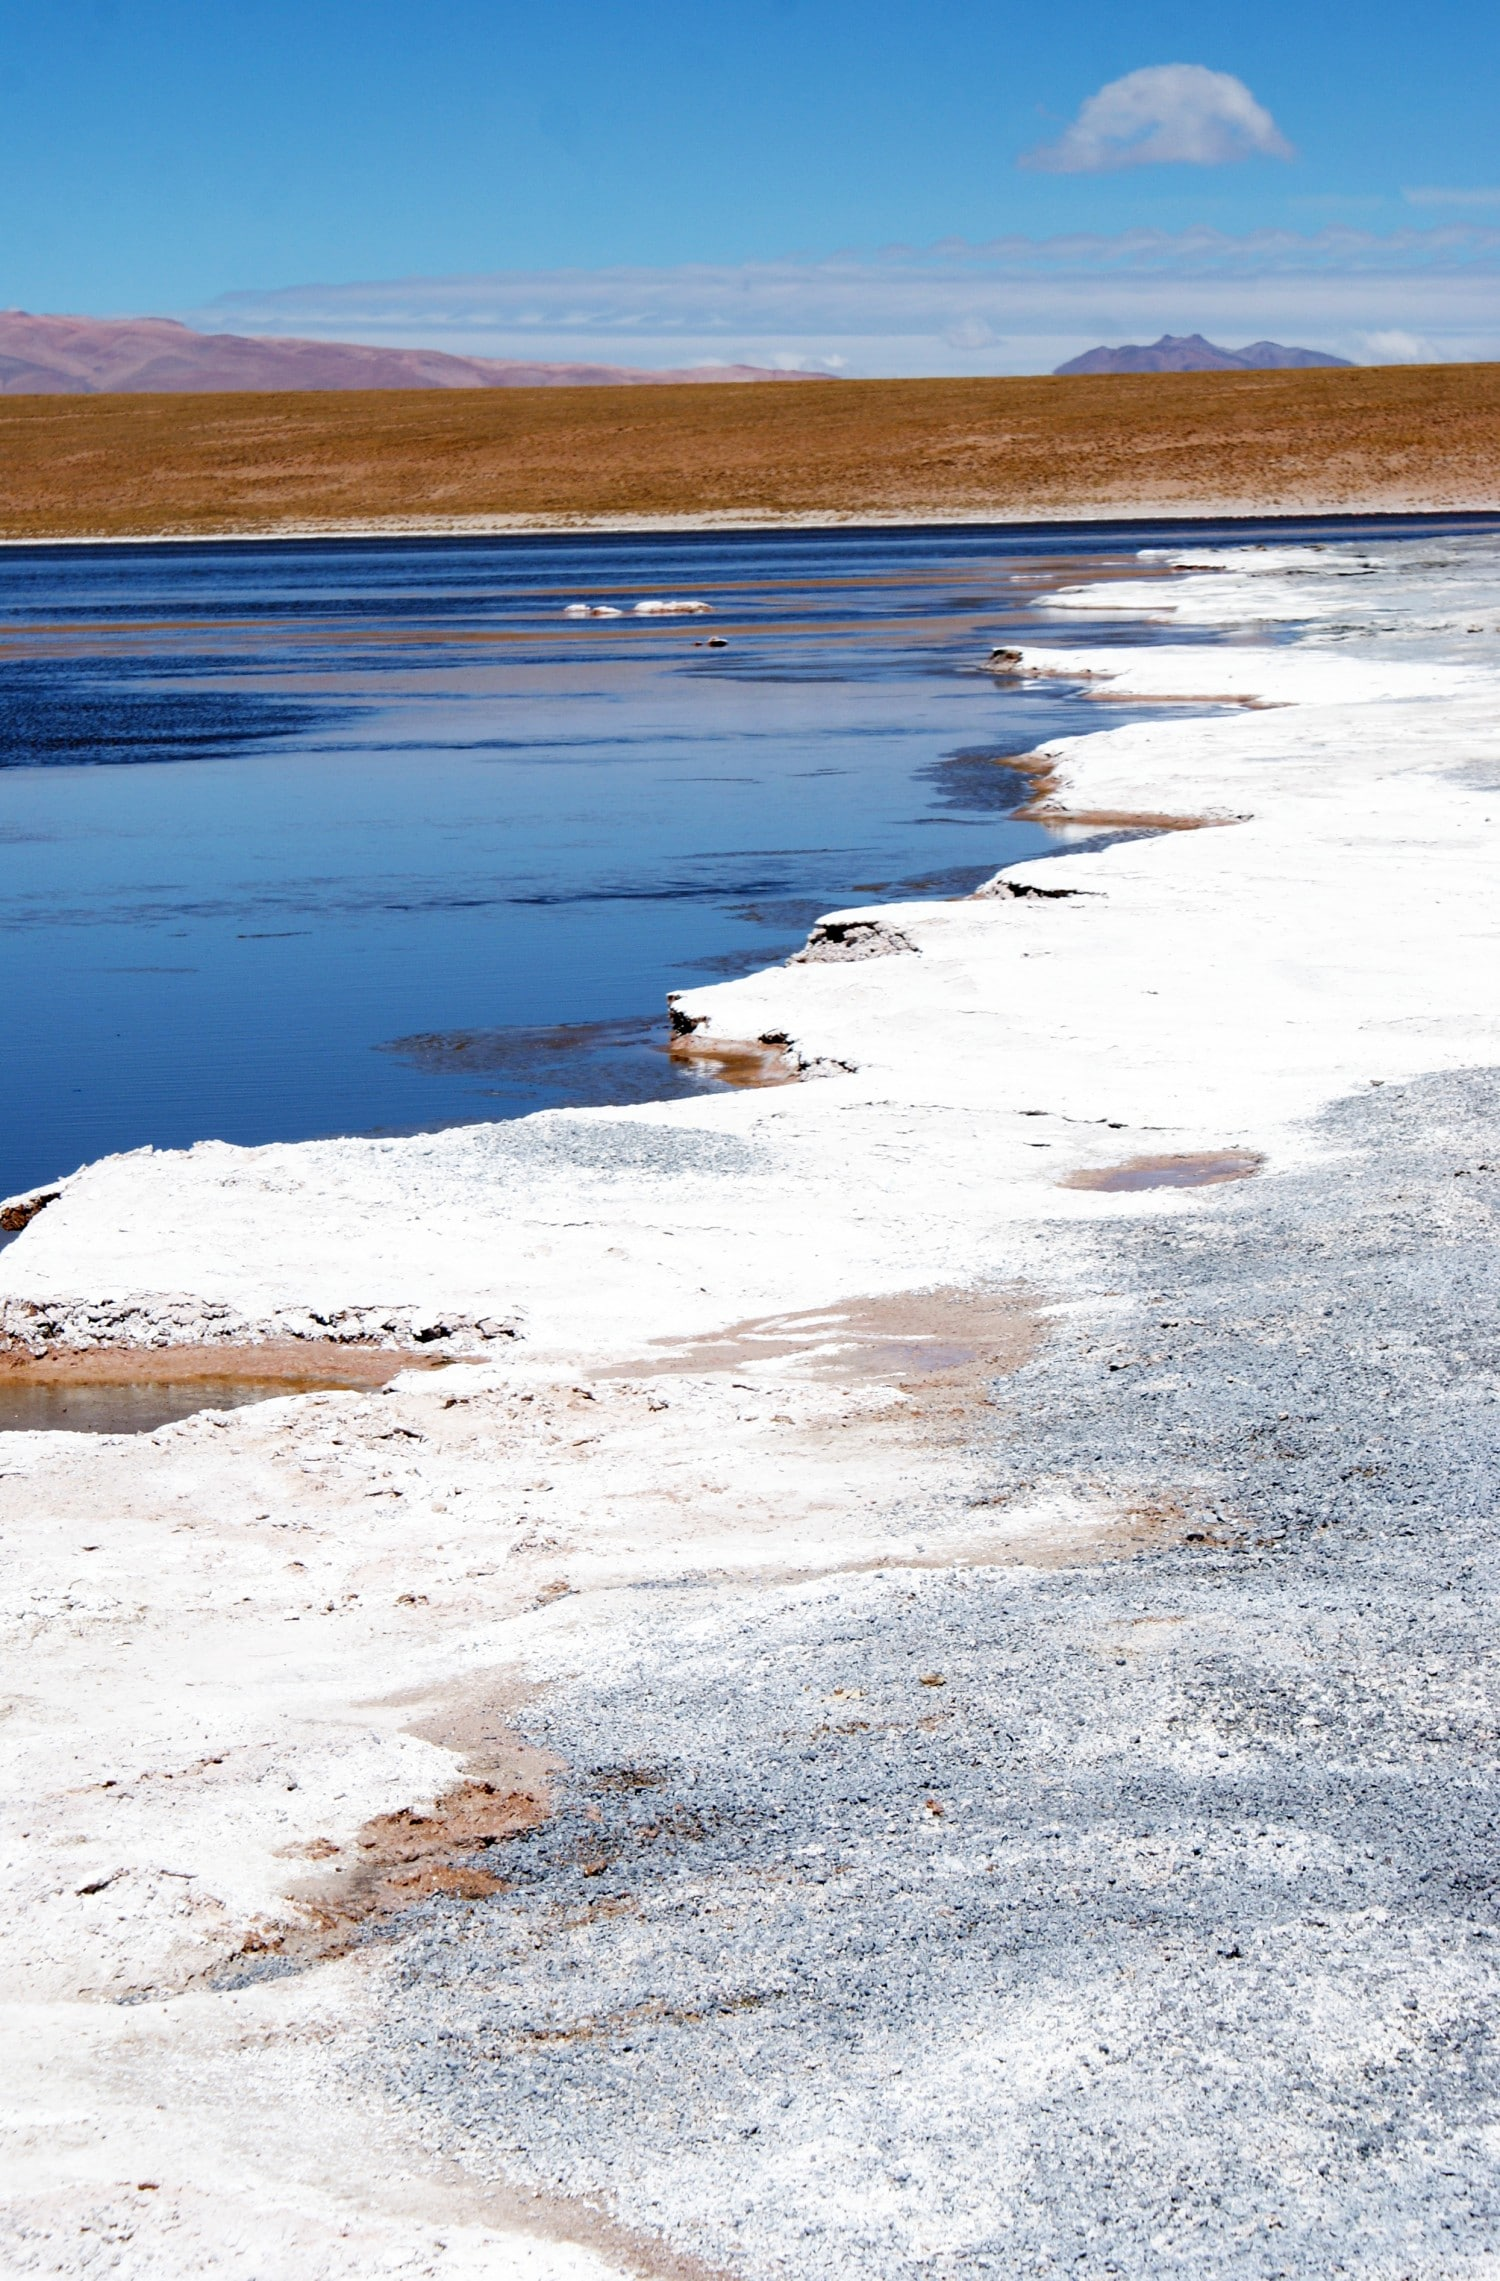 Laguna Blanca - shot of the thick salt crust at the edge of the lake